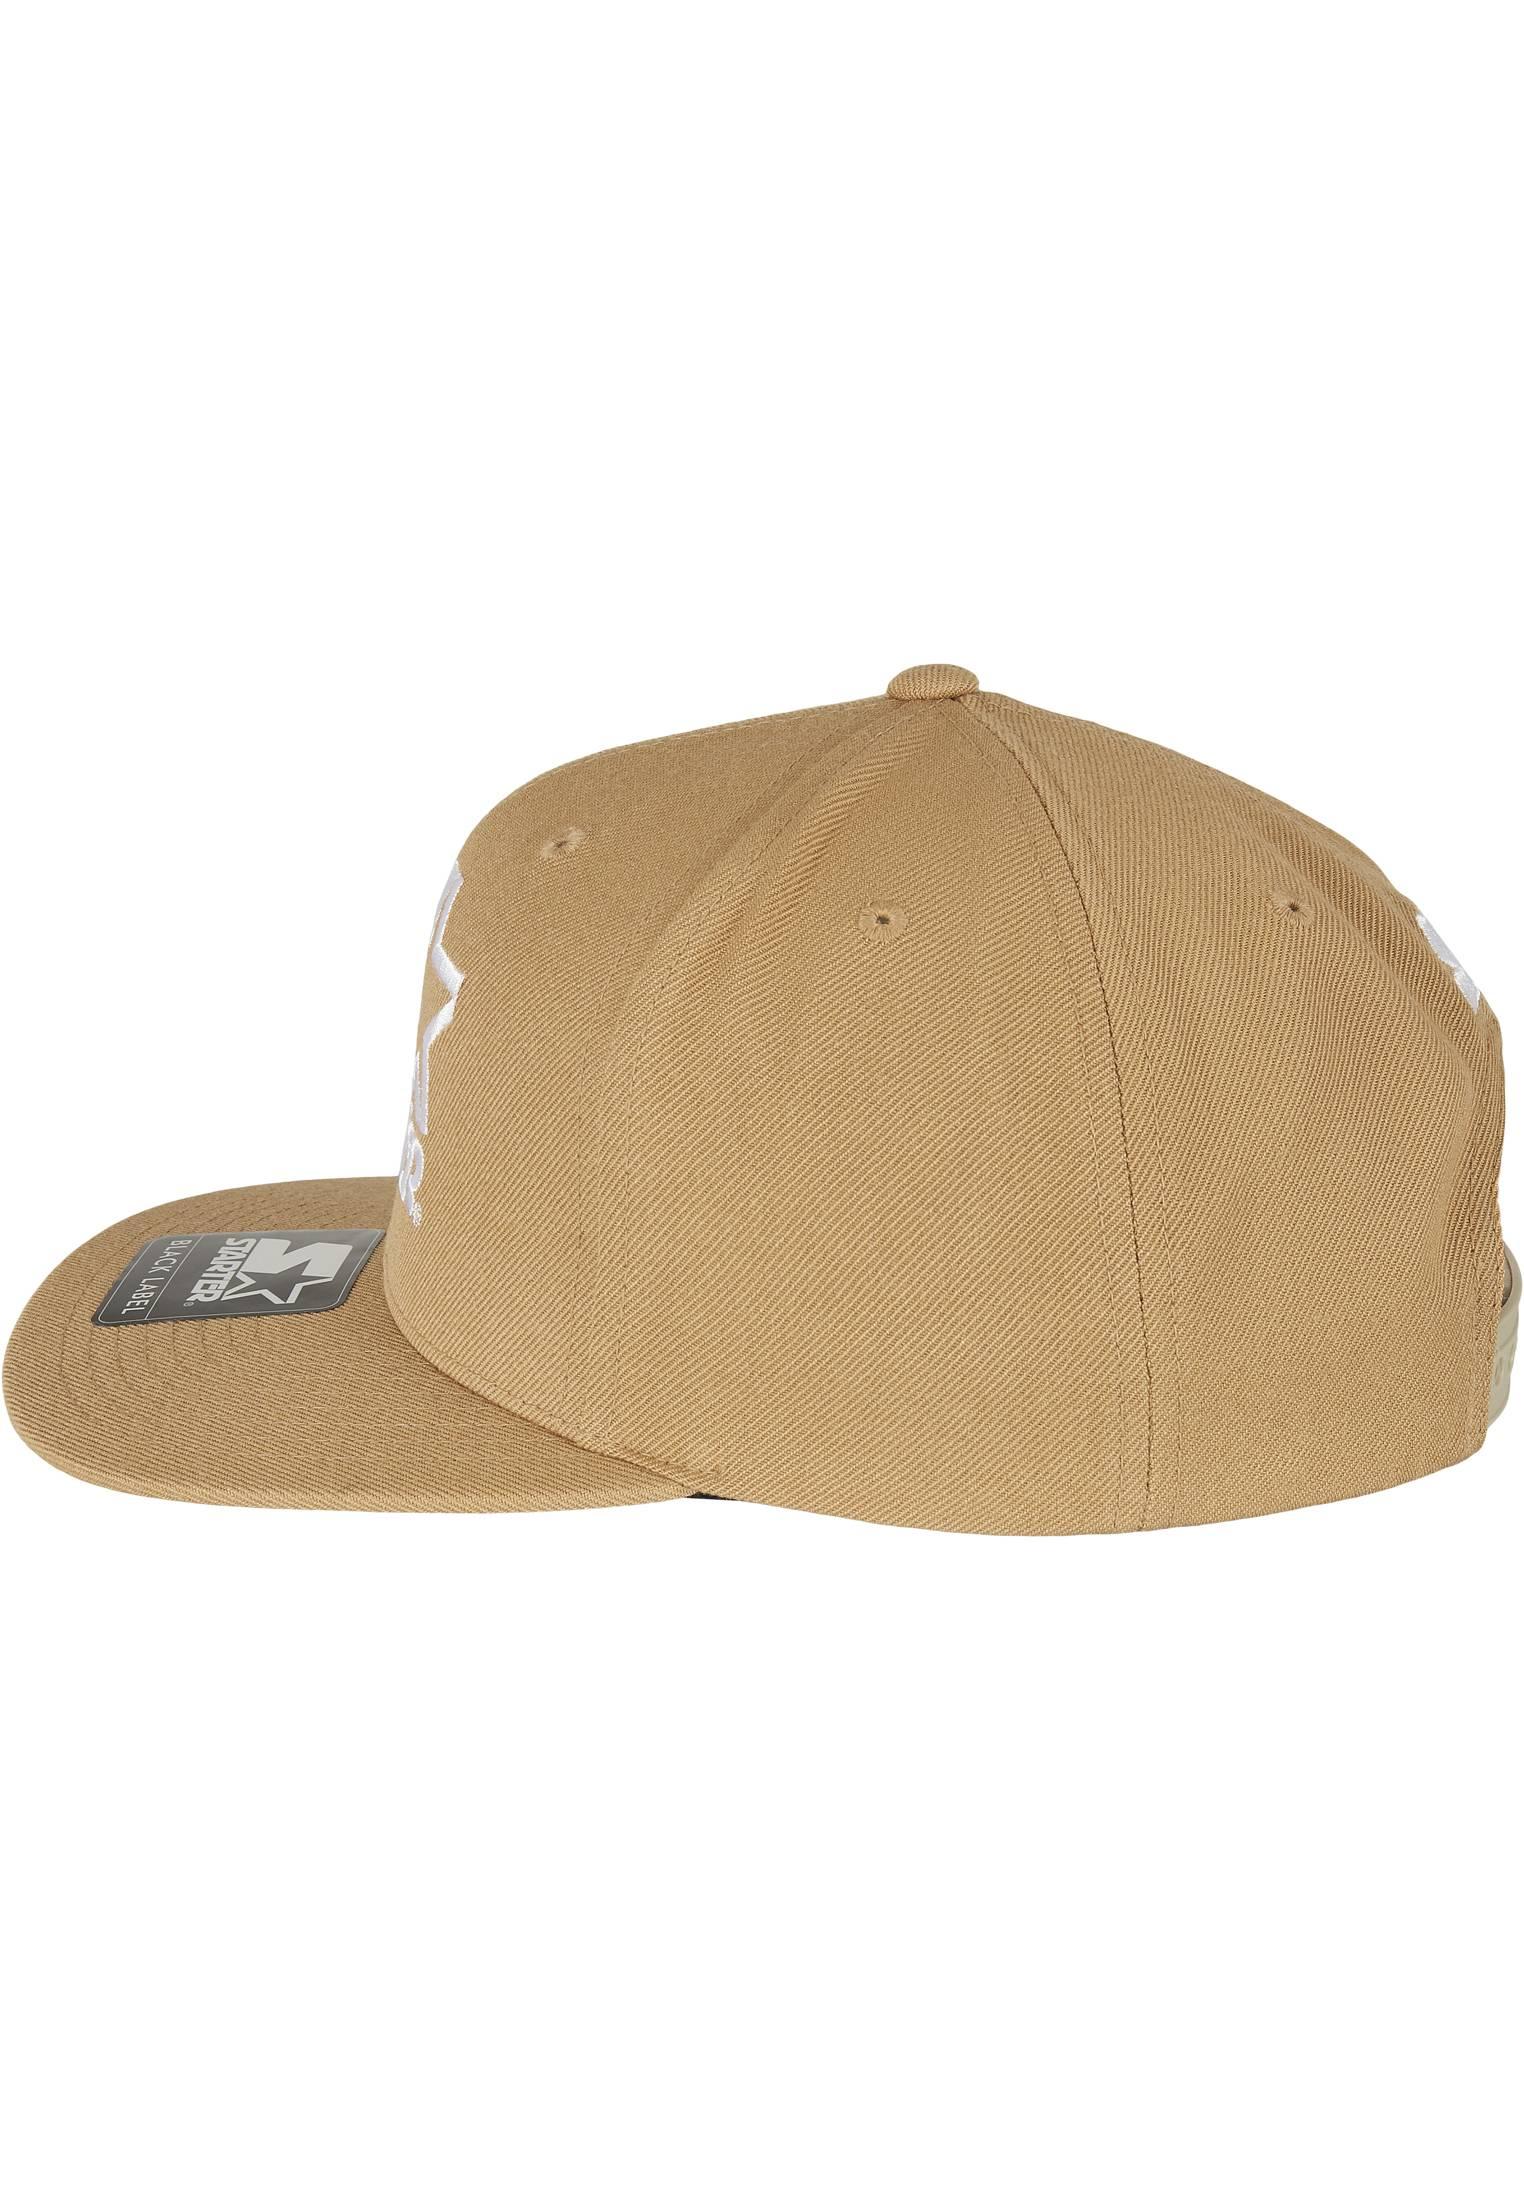 Starter Logo Snapback goldensand - One Size